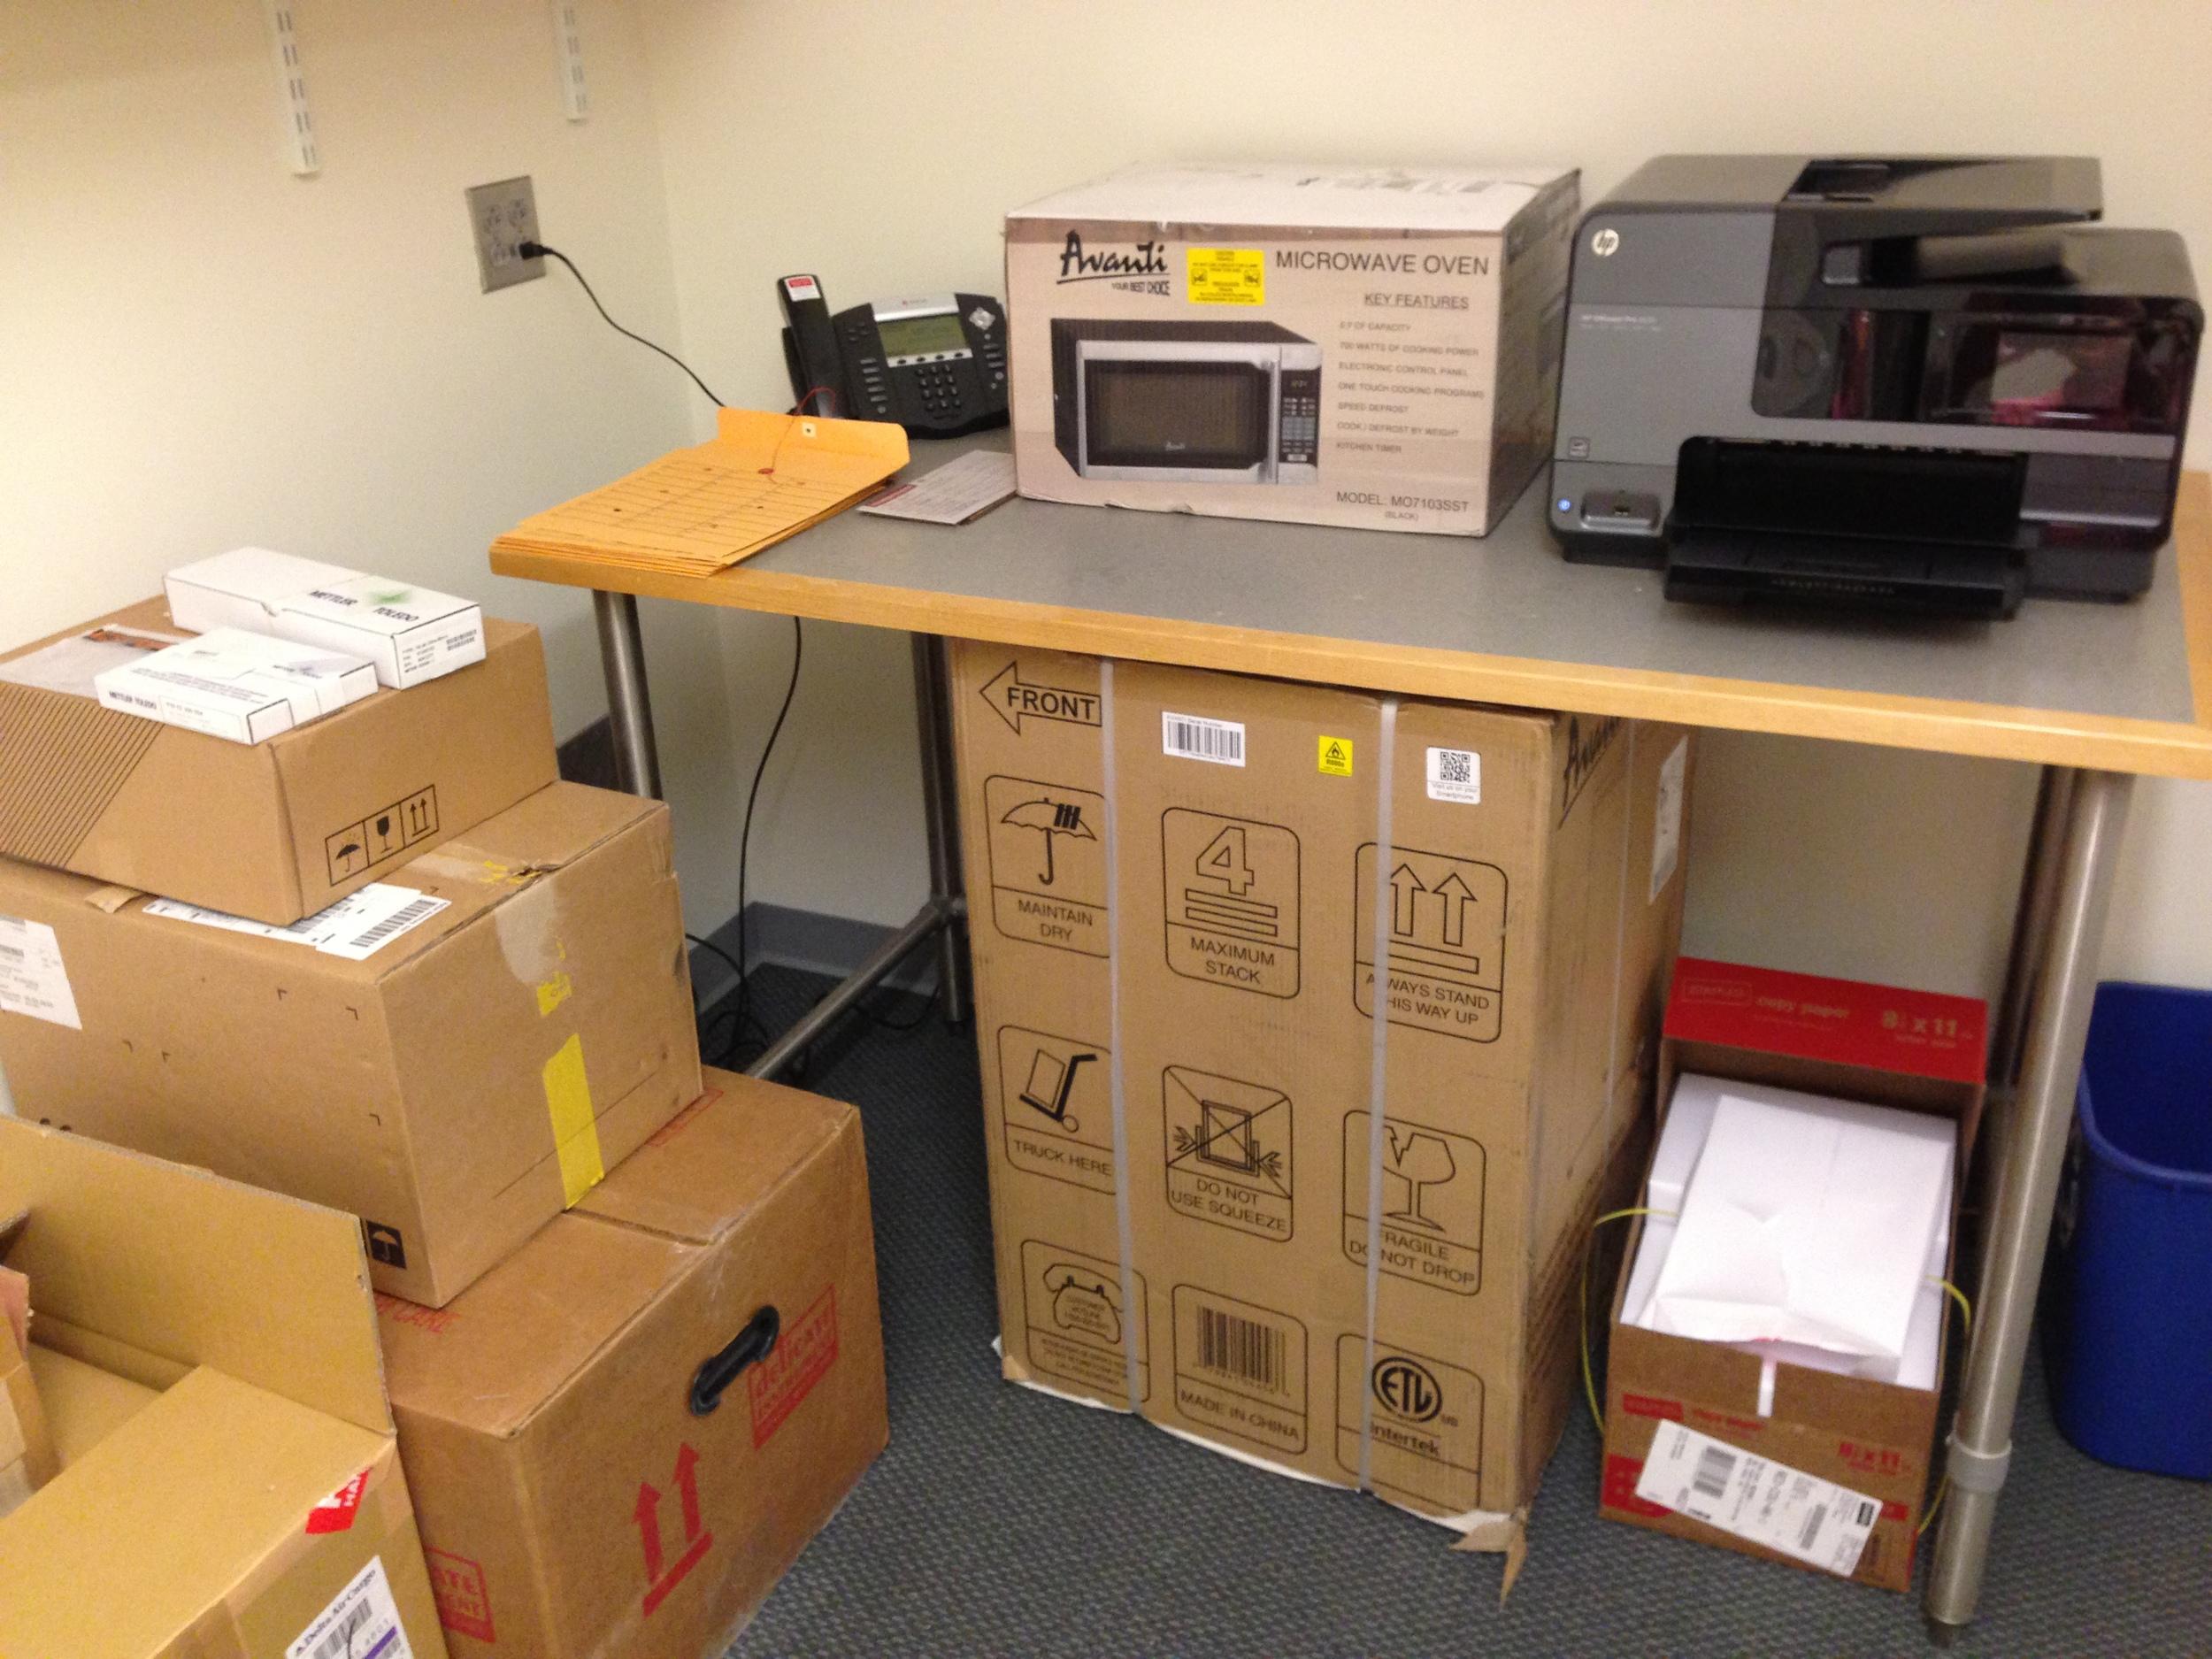 Balance, pH meter, printer, and all important microwave and mini-fridge!